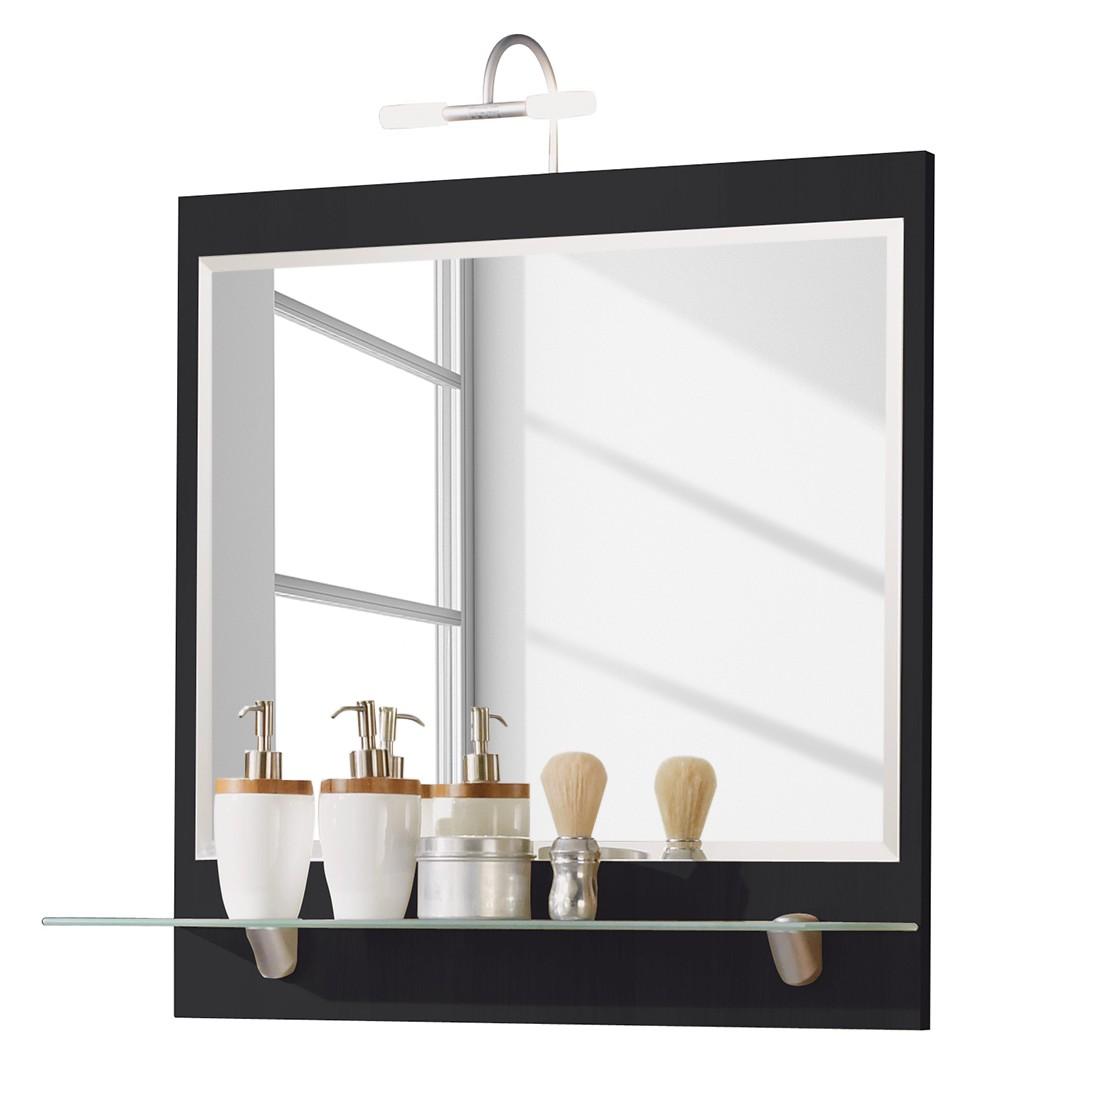 bad spiegel f rs bad online kaufen m bel suchmaschine. Black Bedroom Furniture Sets. Home Design Ideas